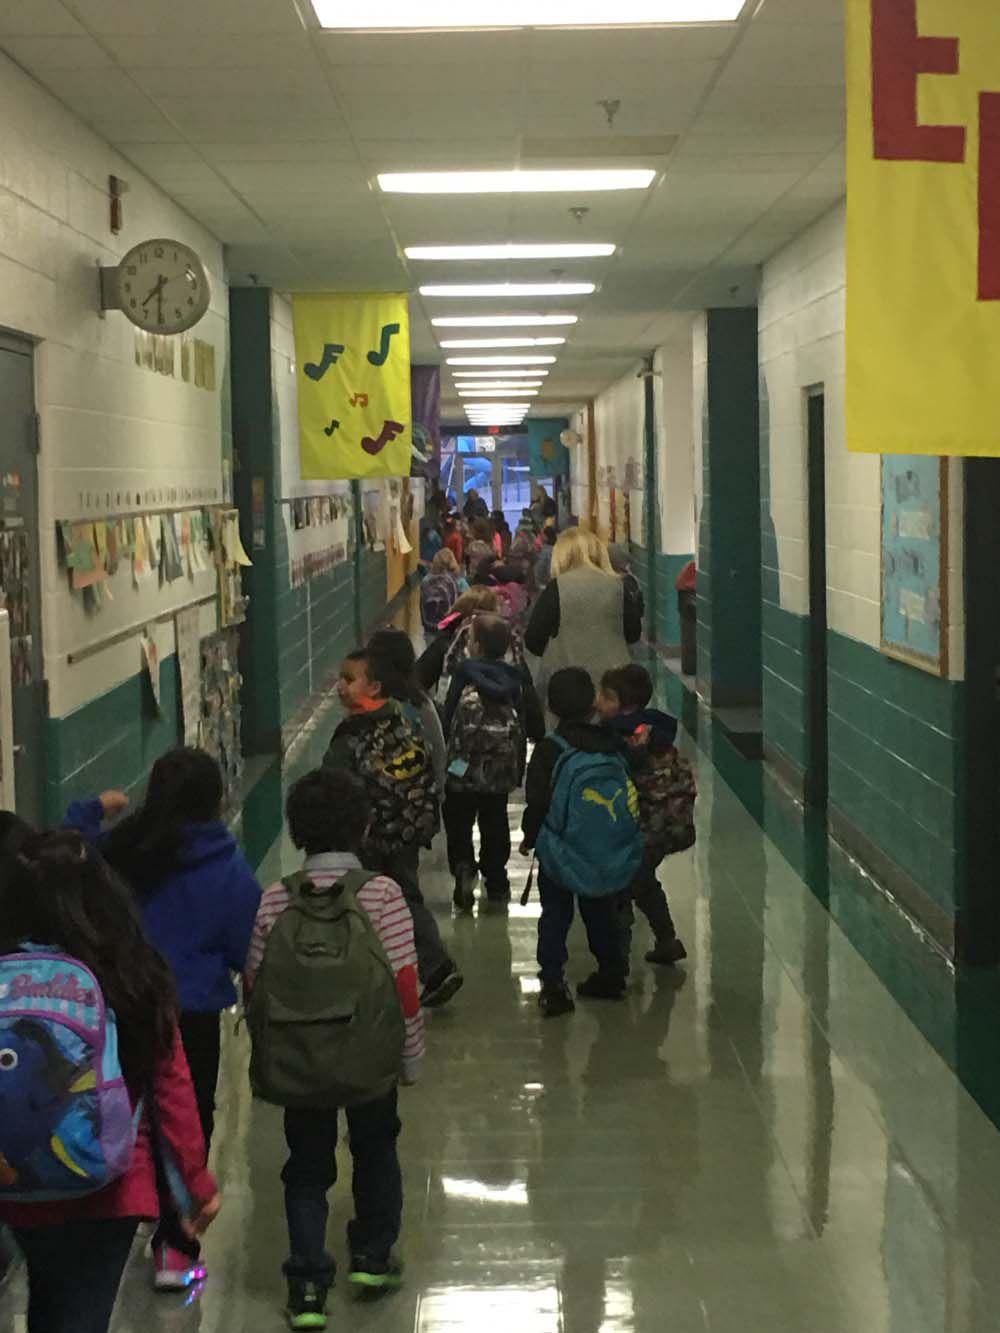 christmas break over students return to school - When Does School Start Back After Christmas Break